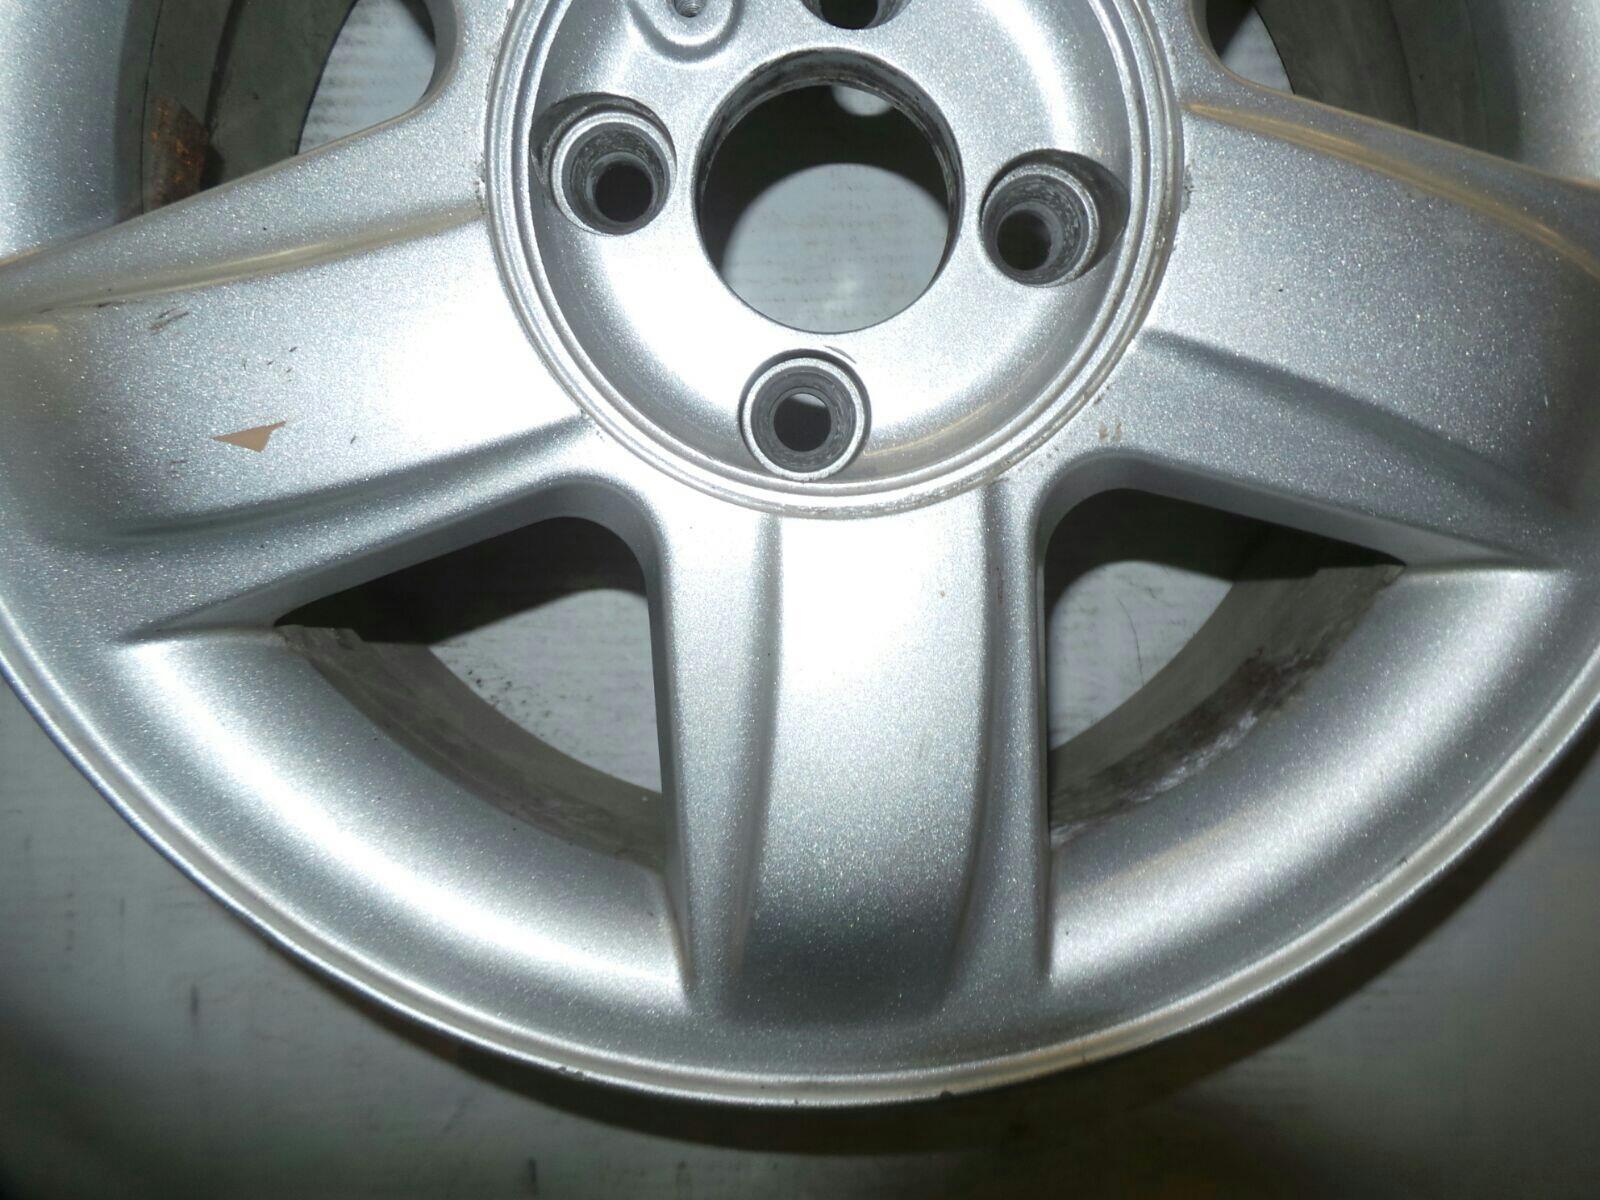 Alloy wheel renault clio 15 inch alloy wheel rim whl51047 for sale alloy wheel renault clio 15 inch alloy wheel rim whl51047 publicscrutiny Images